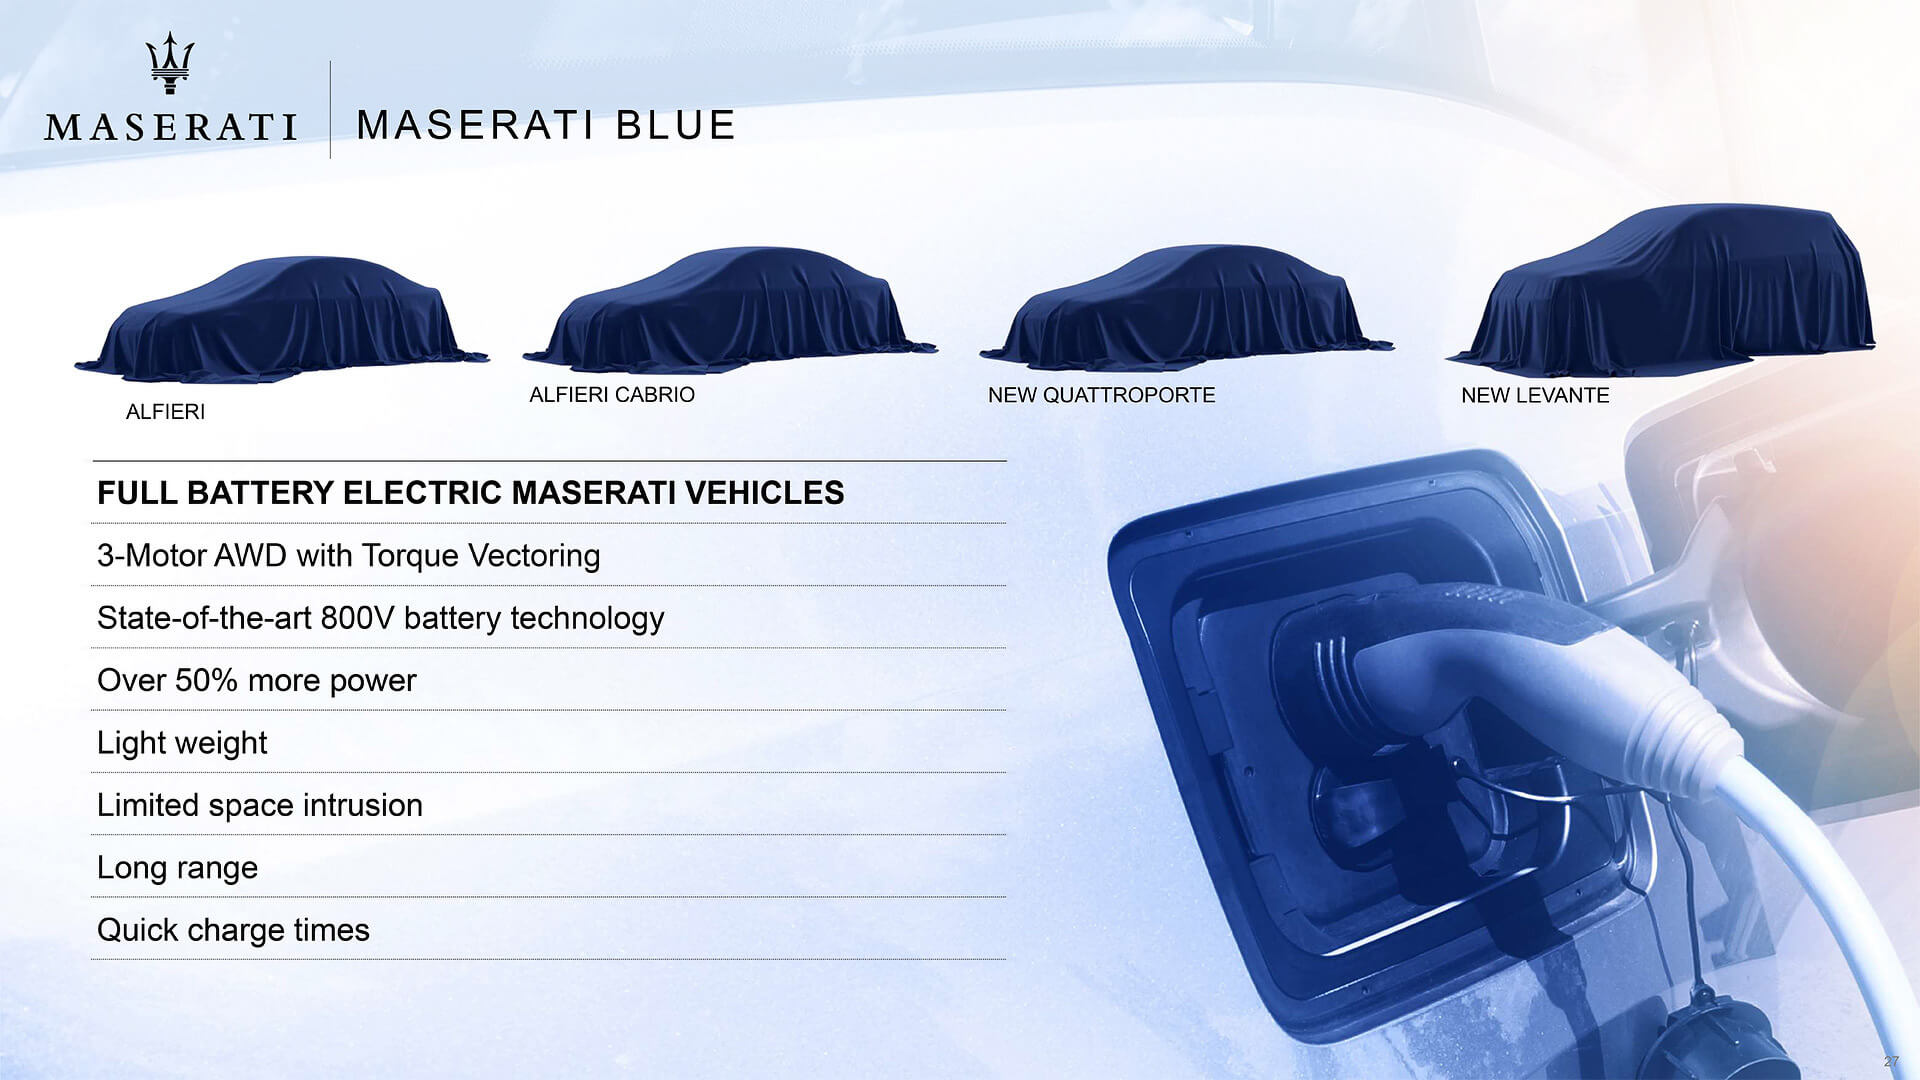 Дорожная карта электромобилей Maserati